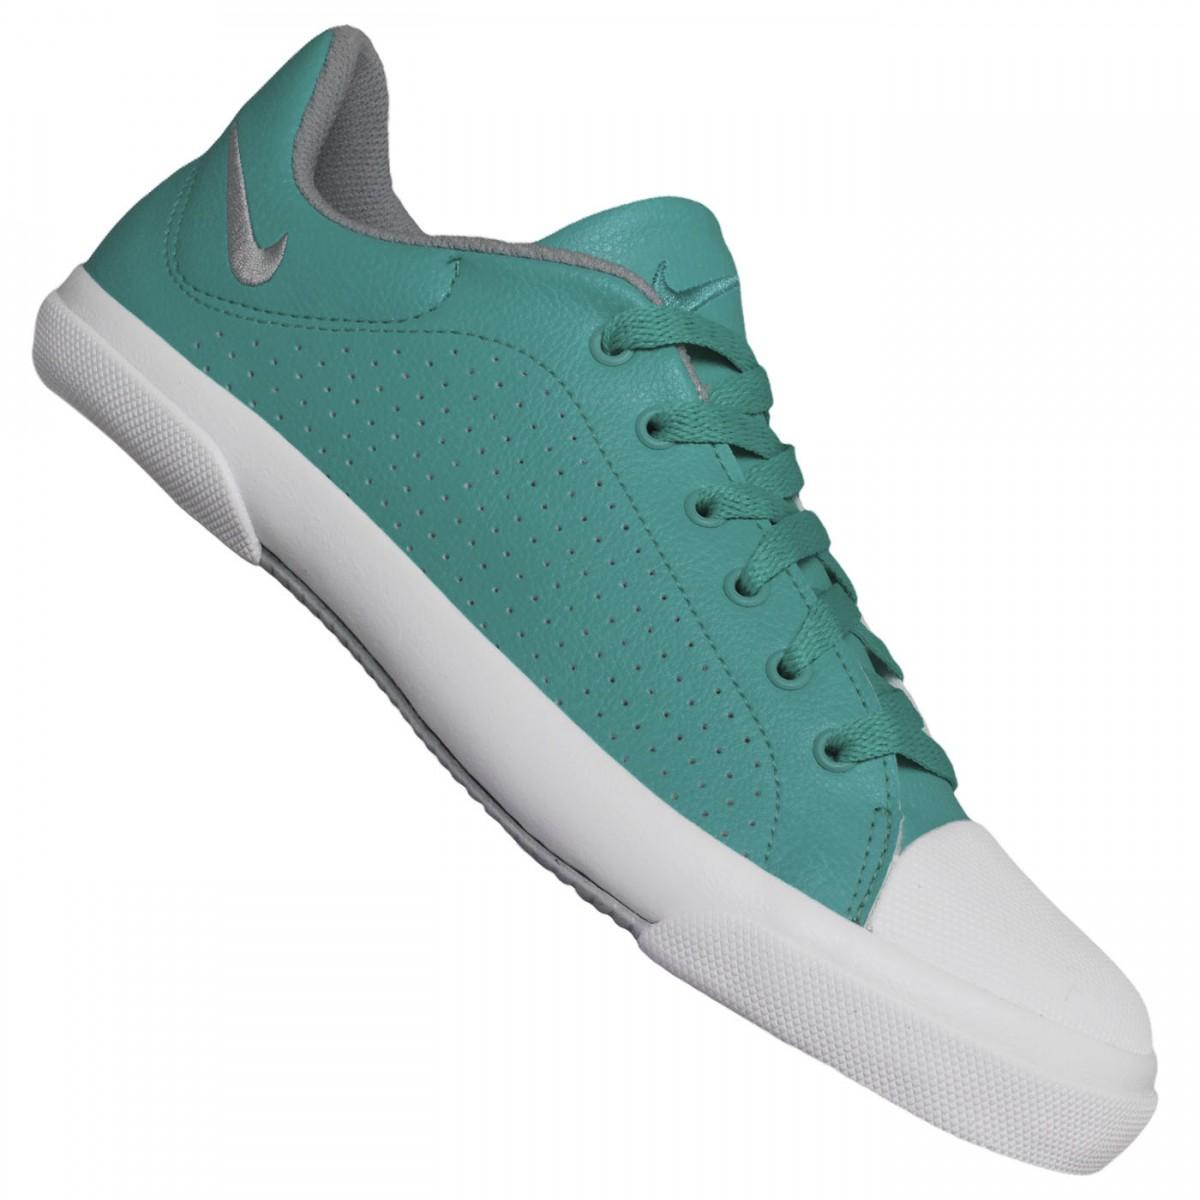 75a2be1b815 Tênis Nike Biscuit 2 SL - Feminino